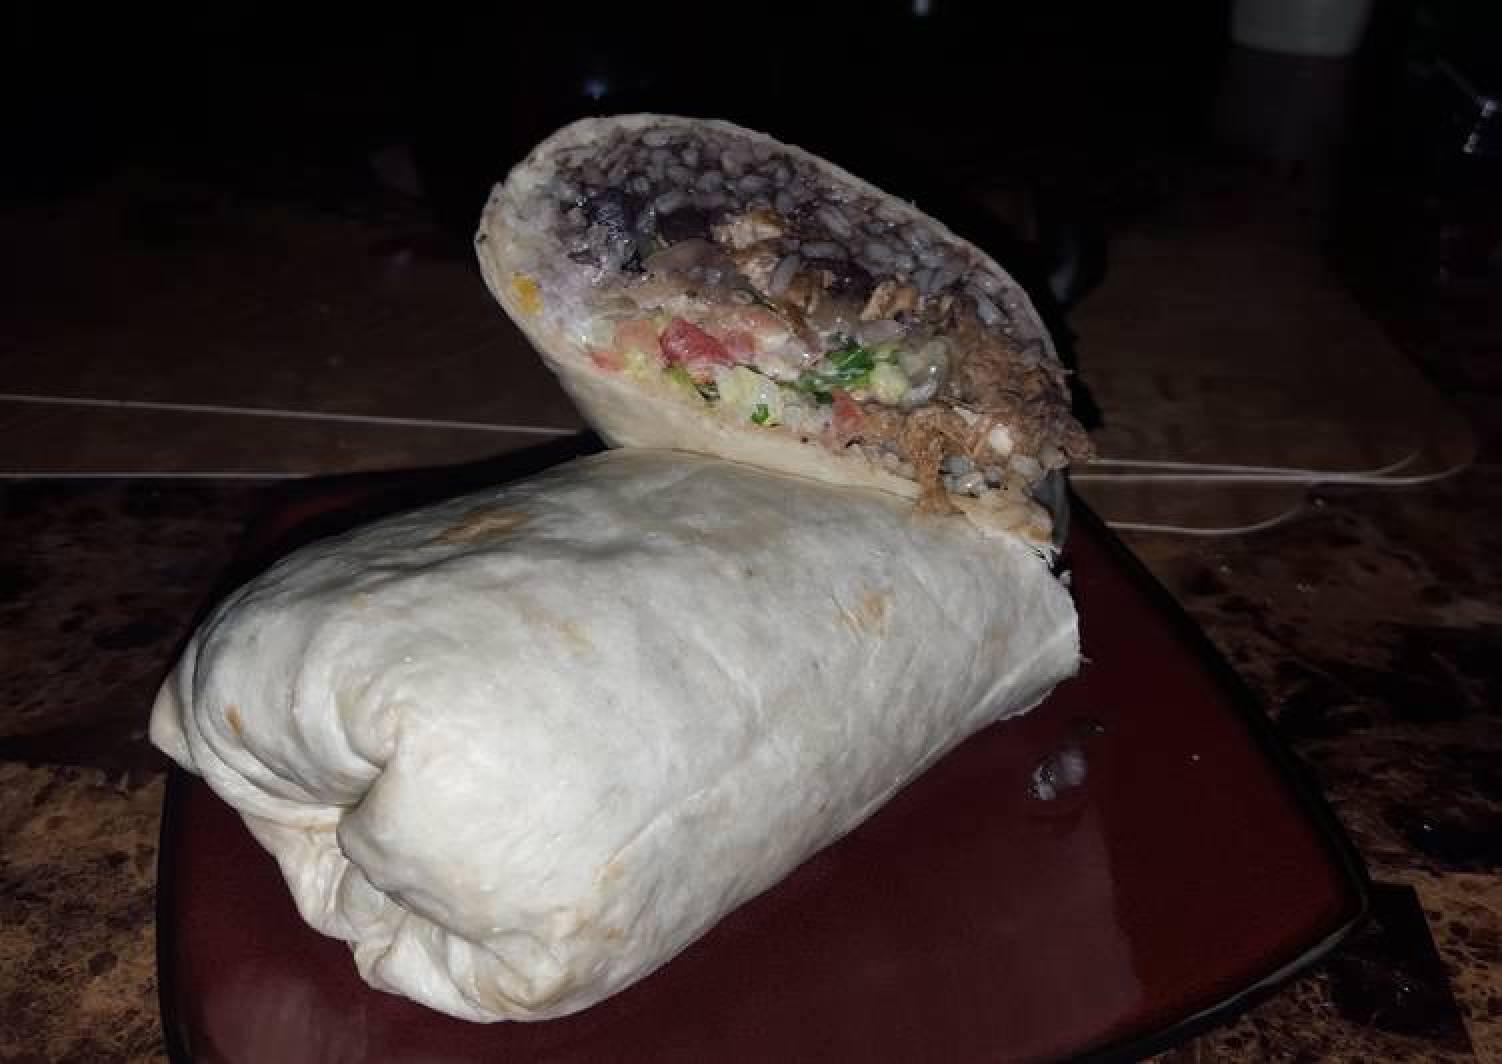 Grilled chicken and braised pork burrito